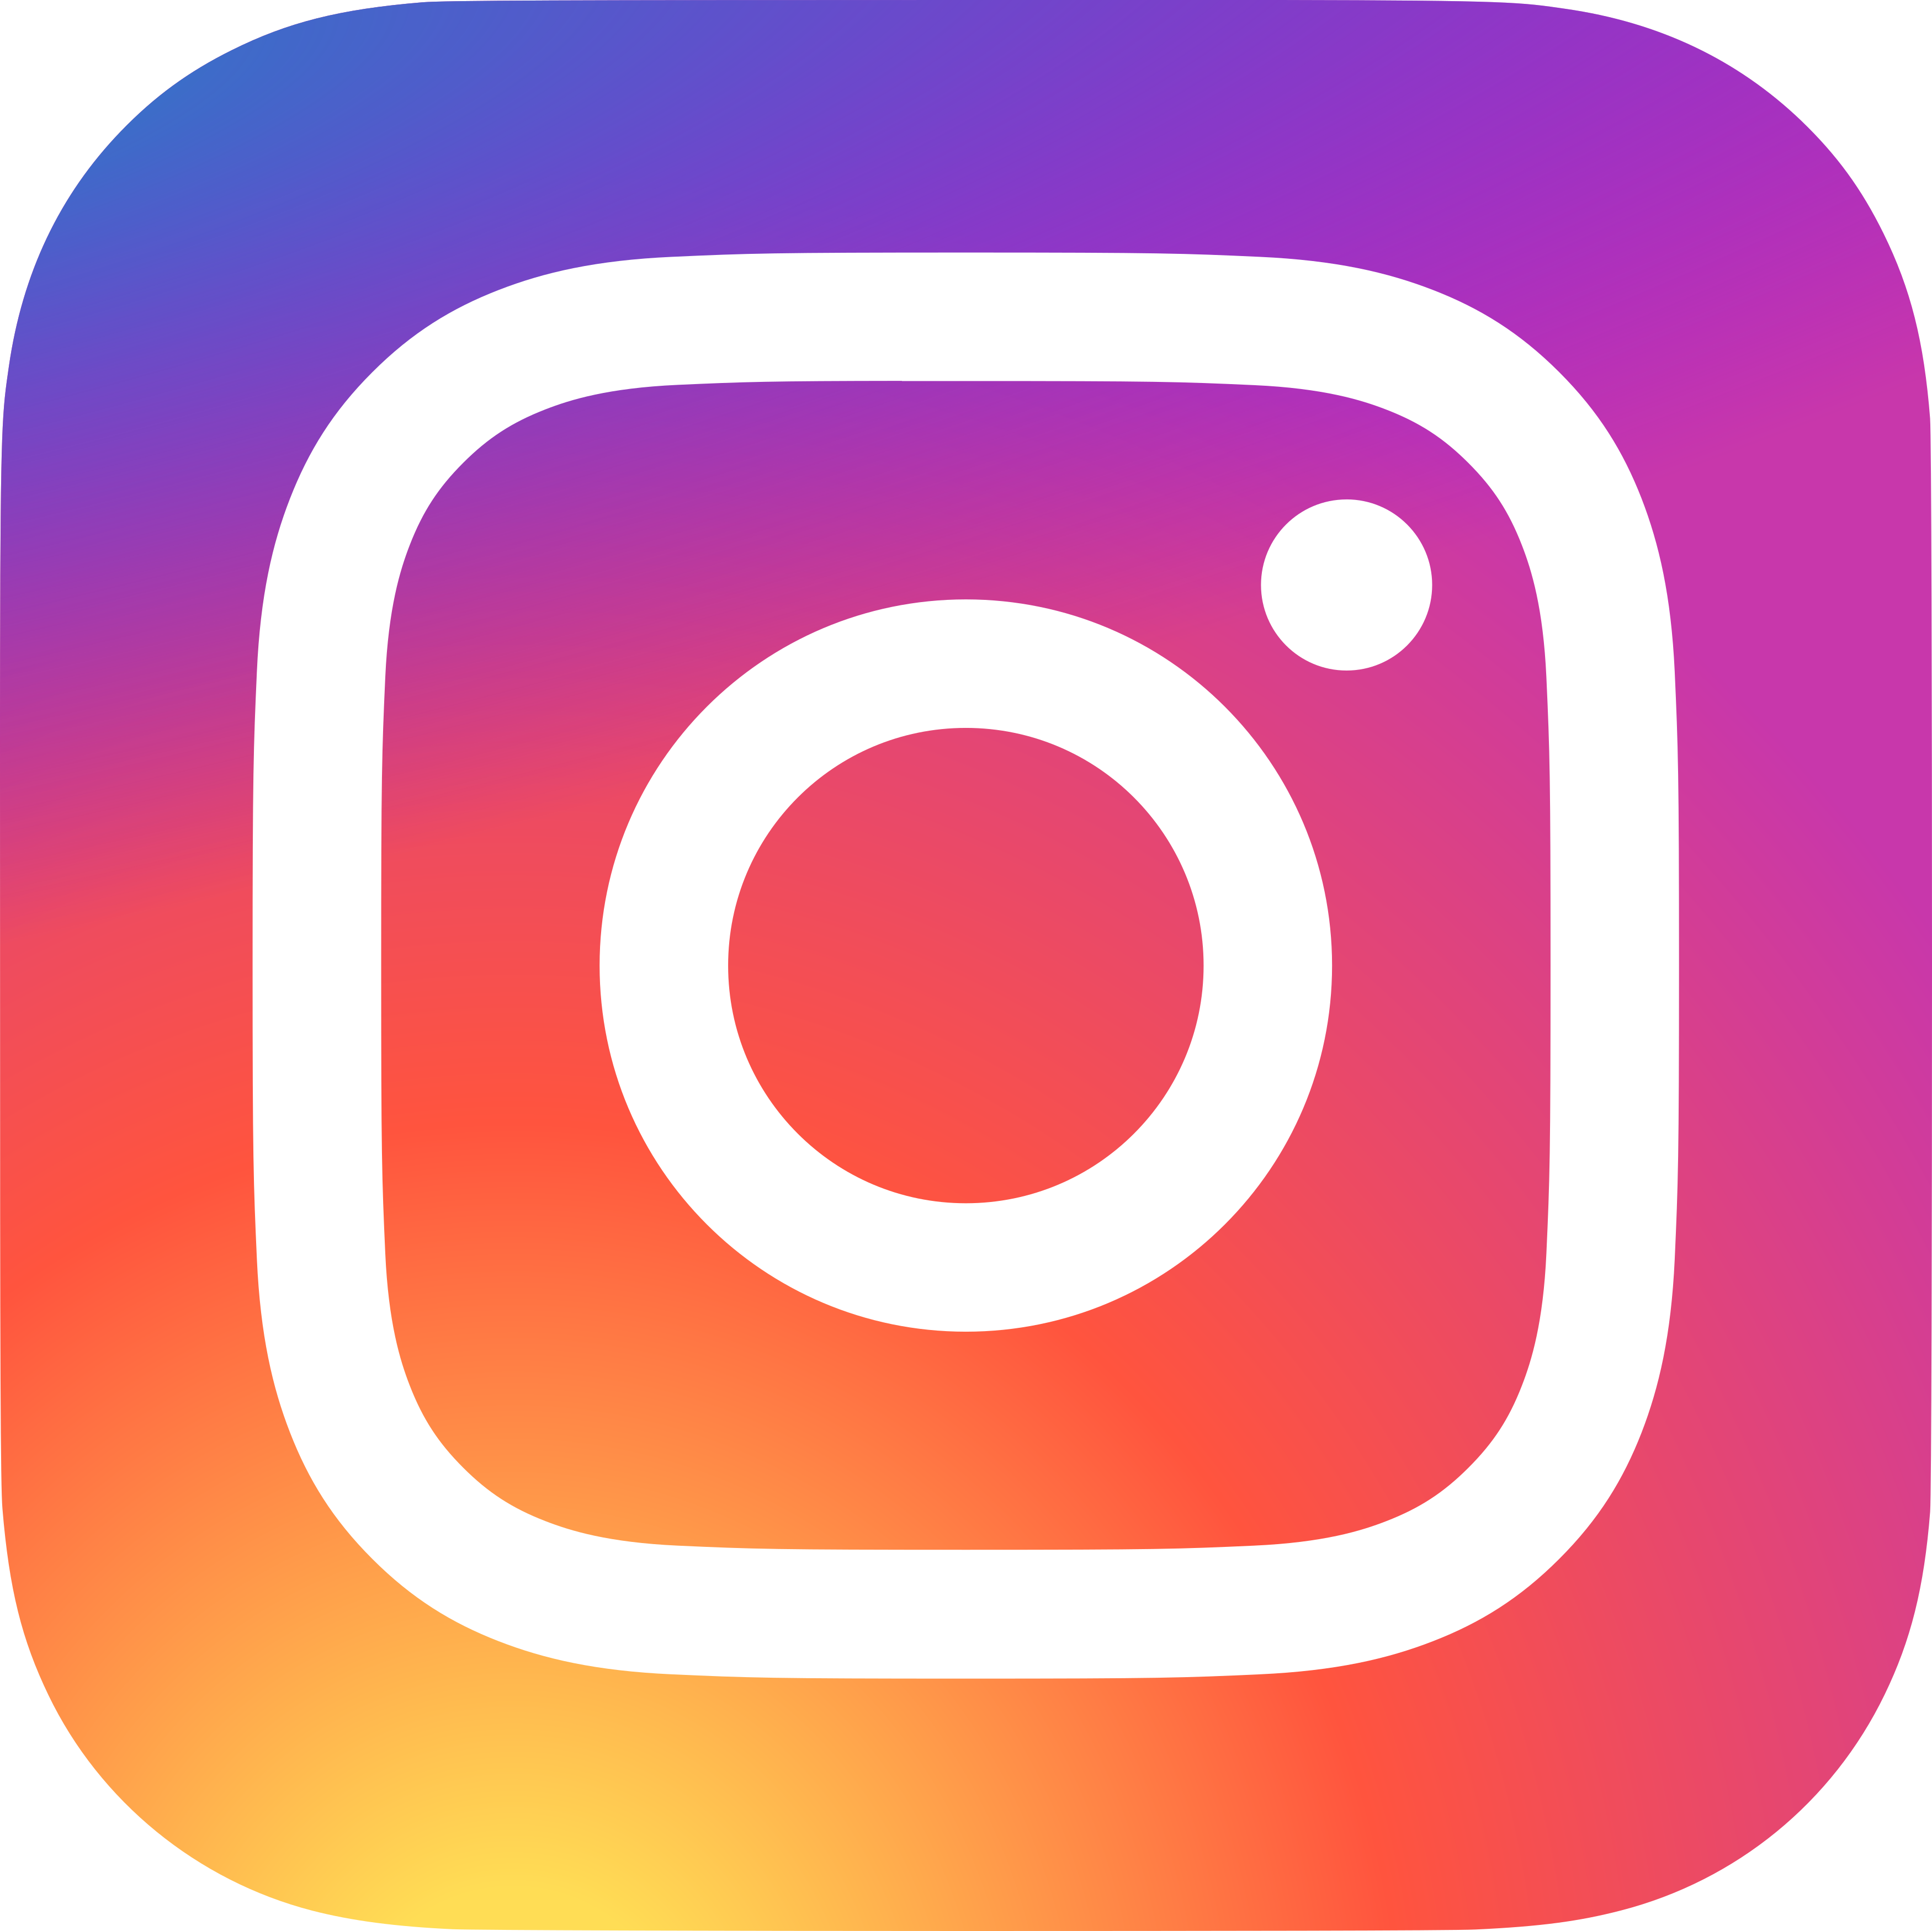 Instagram Ping